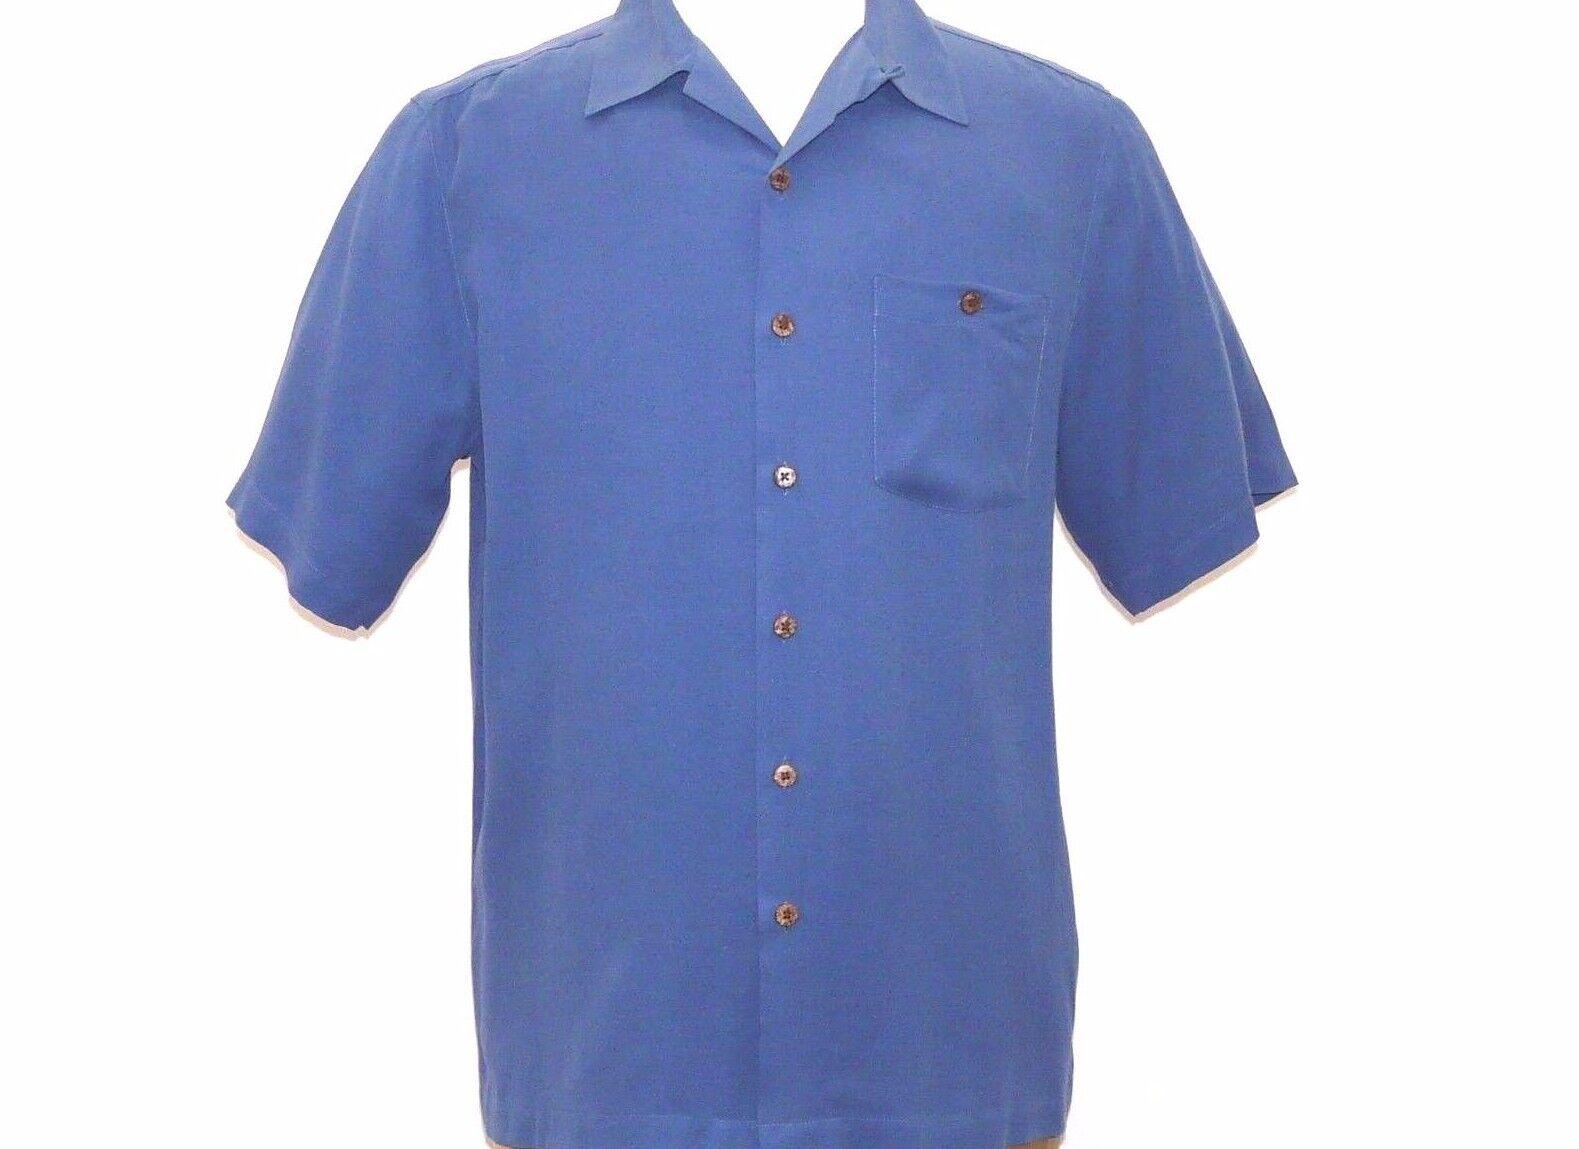 Mens 100% Silk Short Sleeves Shirt Beyond Paradise Dressy casual 3005 -10 navy